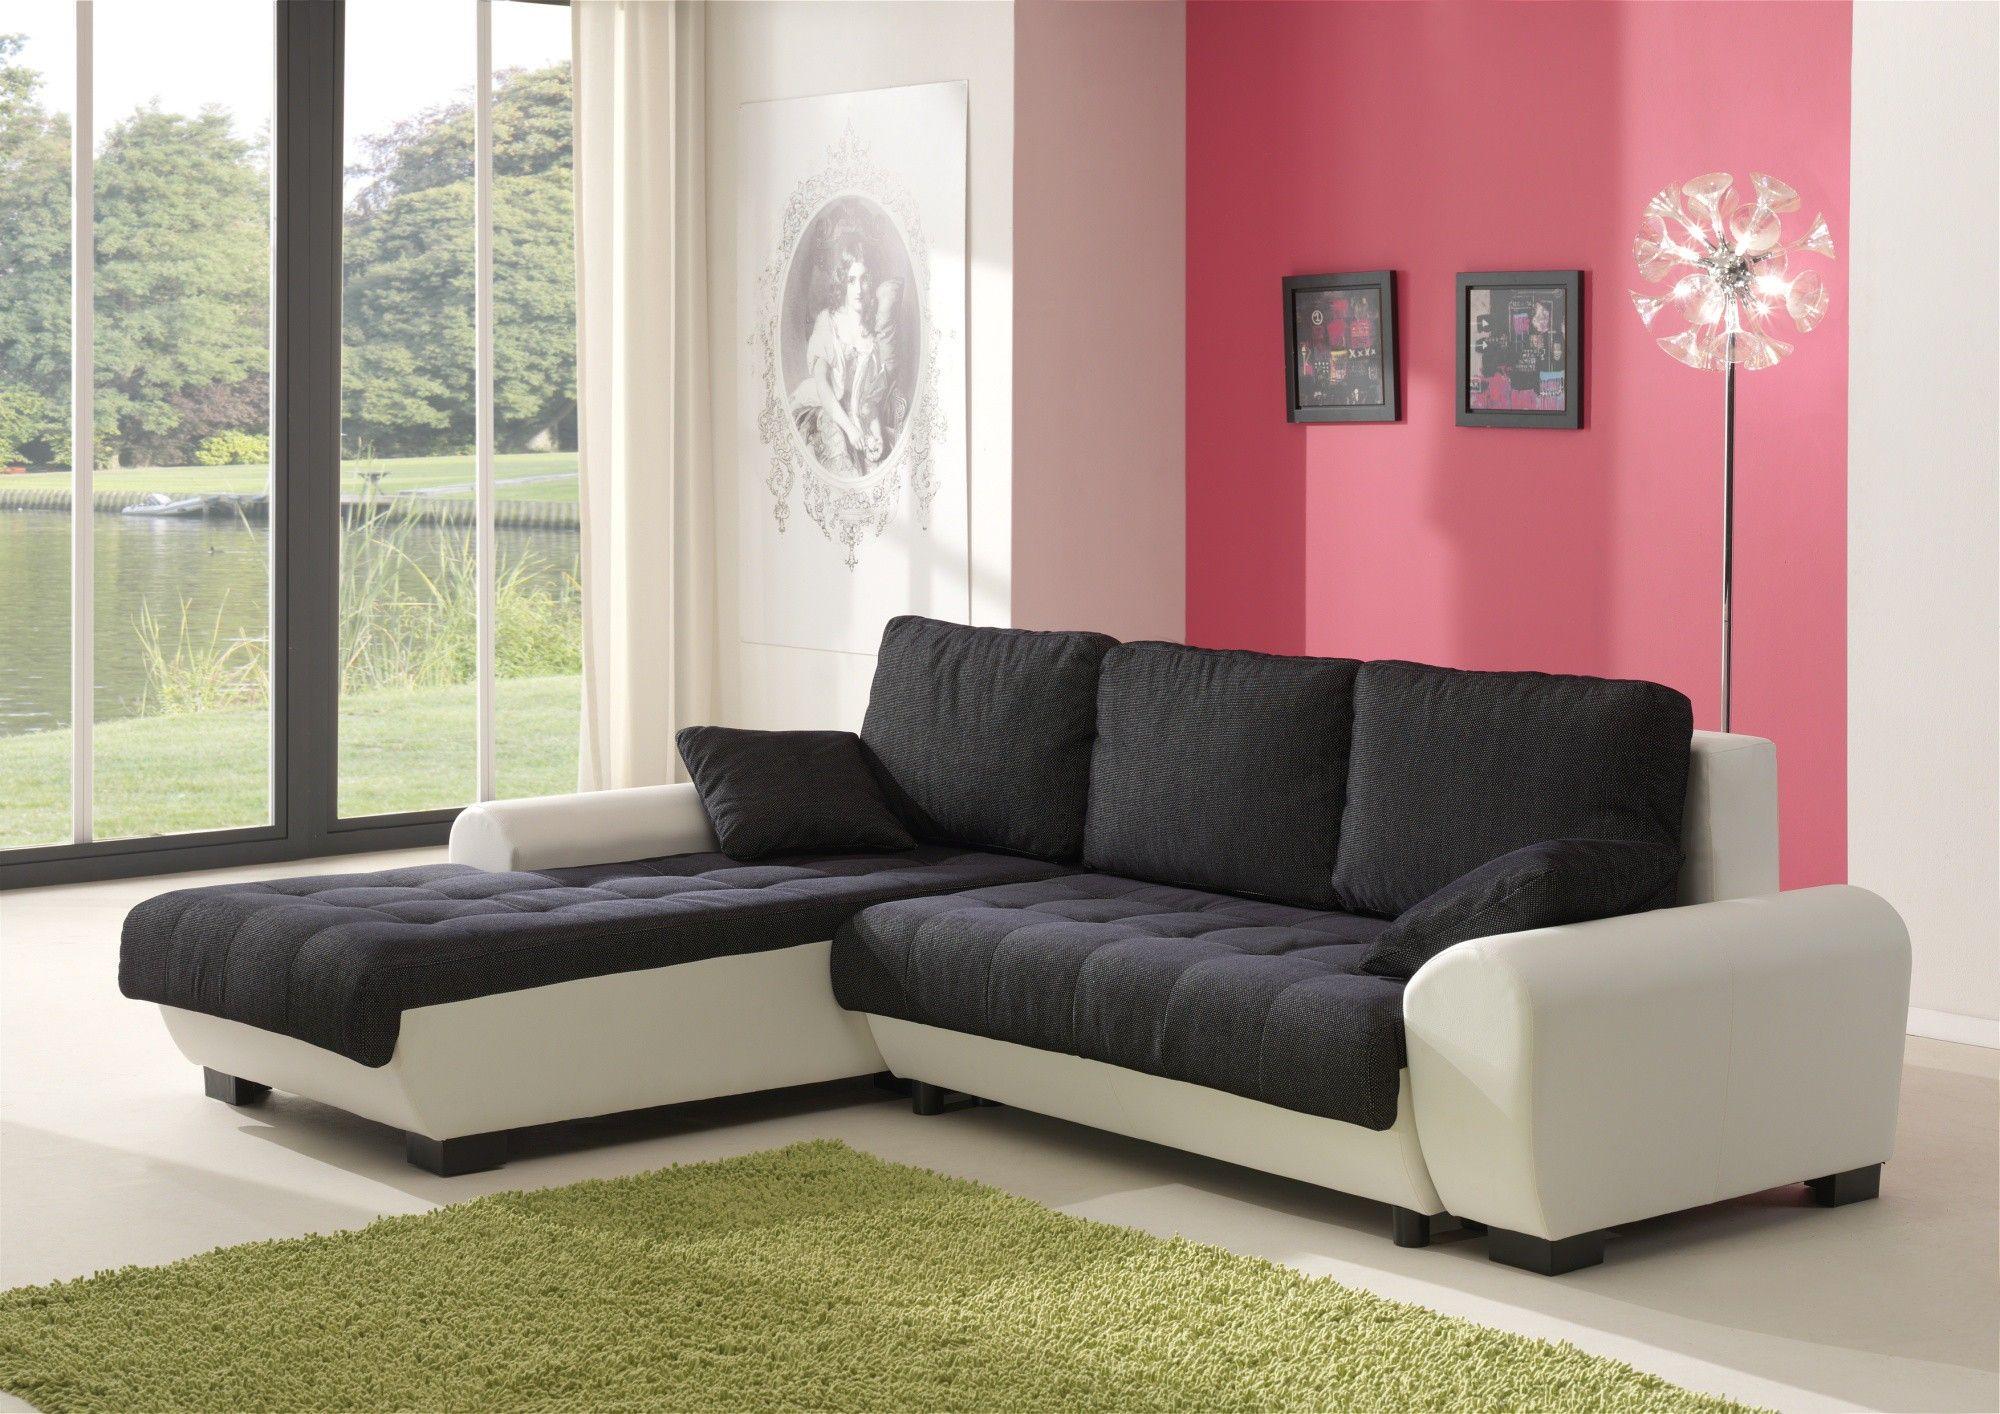 canap d 39 angle contemporain convertible en tissu coloris noir blanc iseult. Black Bedroom Furniture Sets. Home Design Ideas